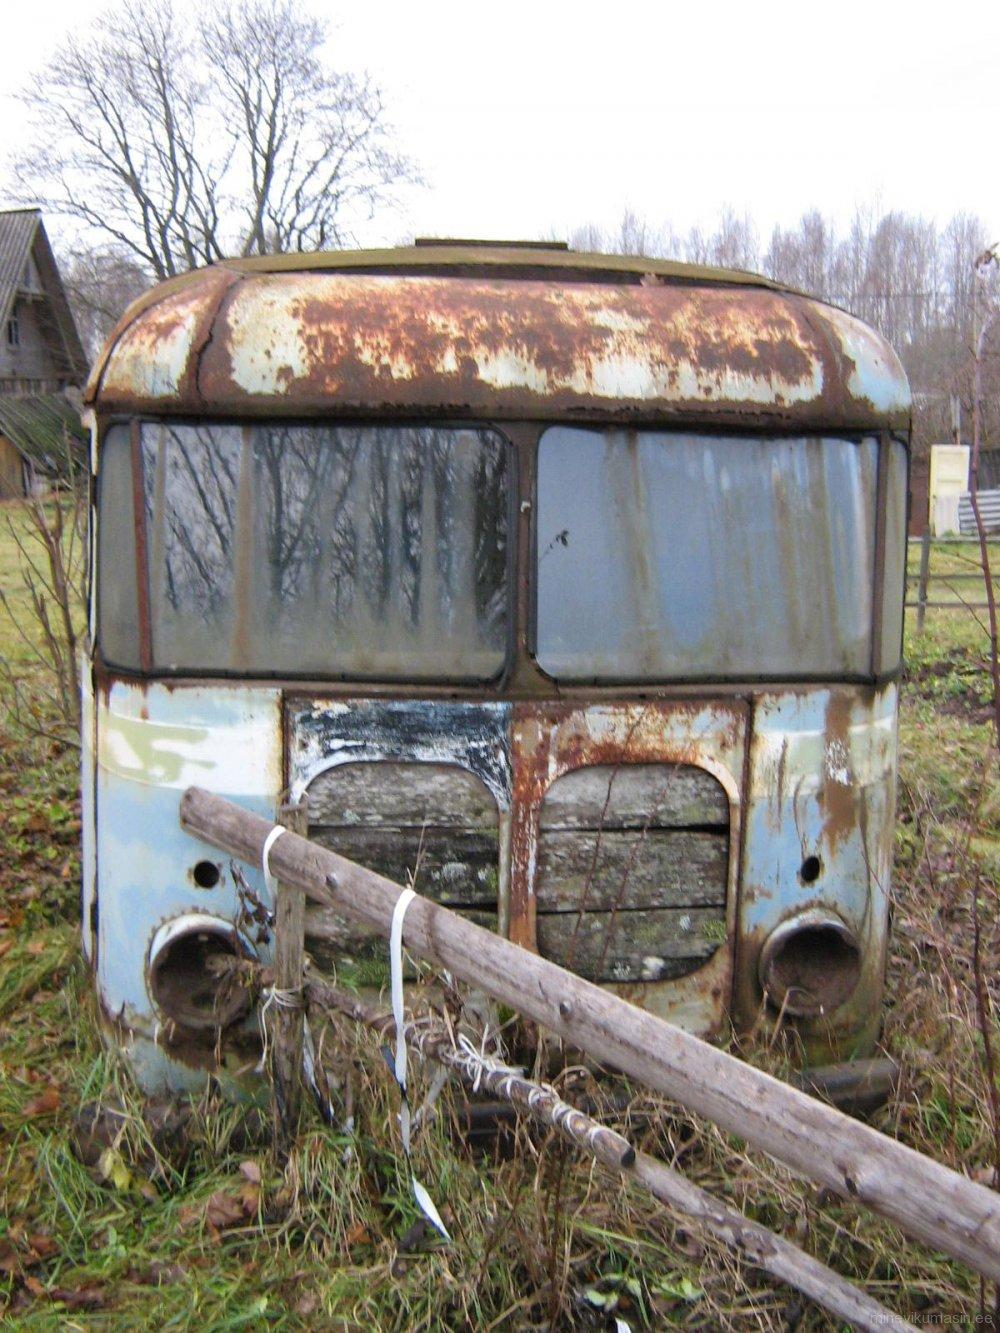 Endine Tartu 3053. autokolonni furgoonauto TA-9E.